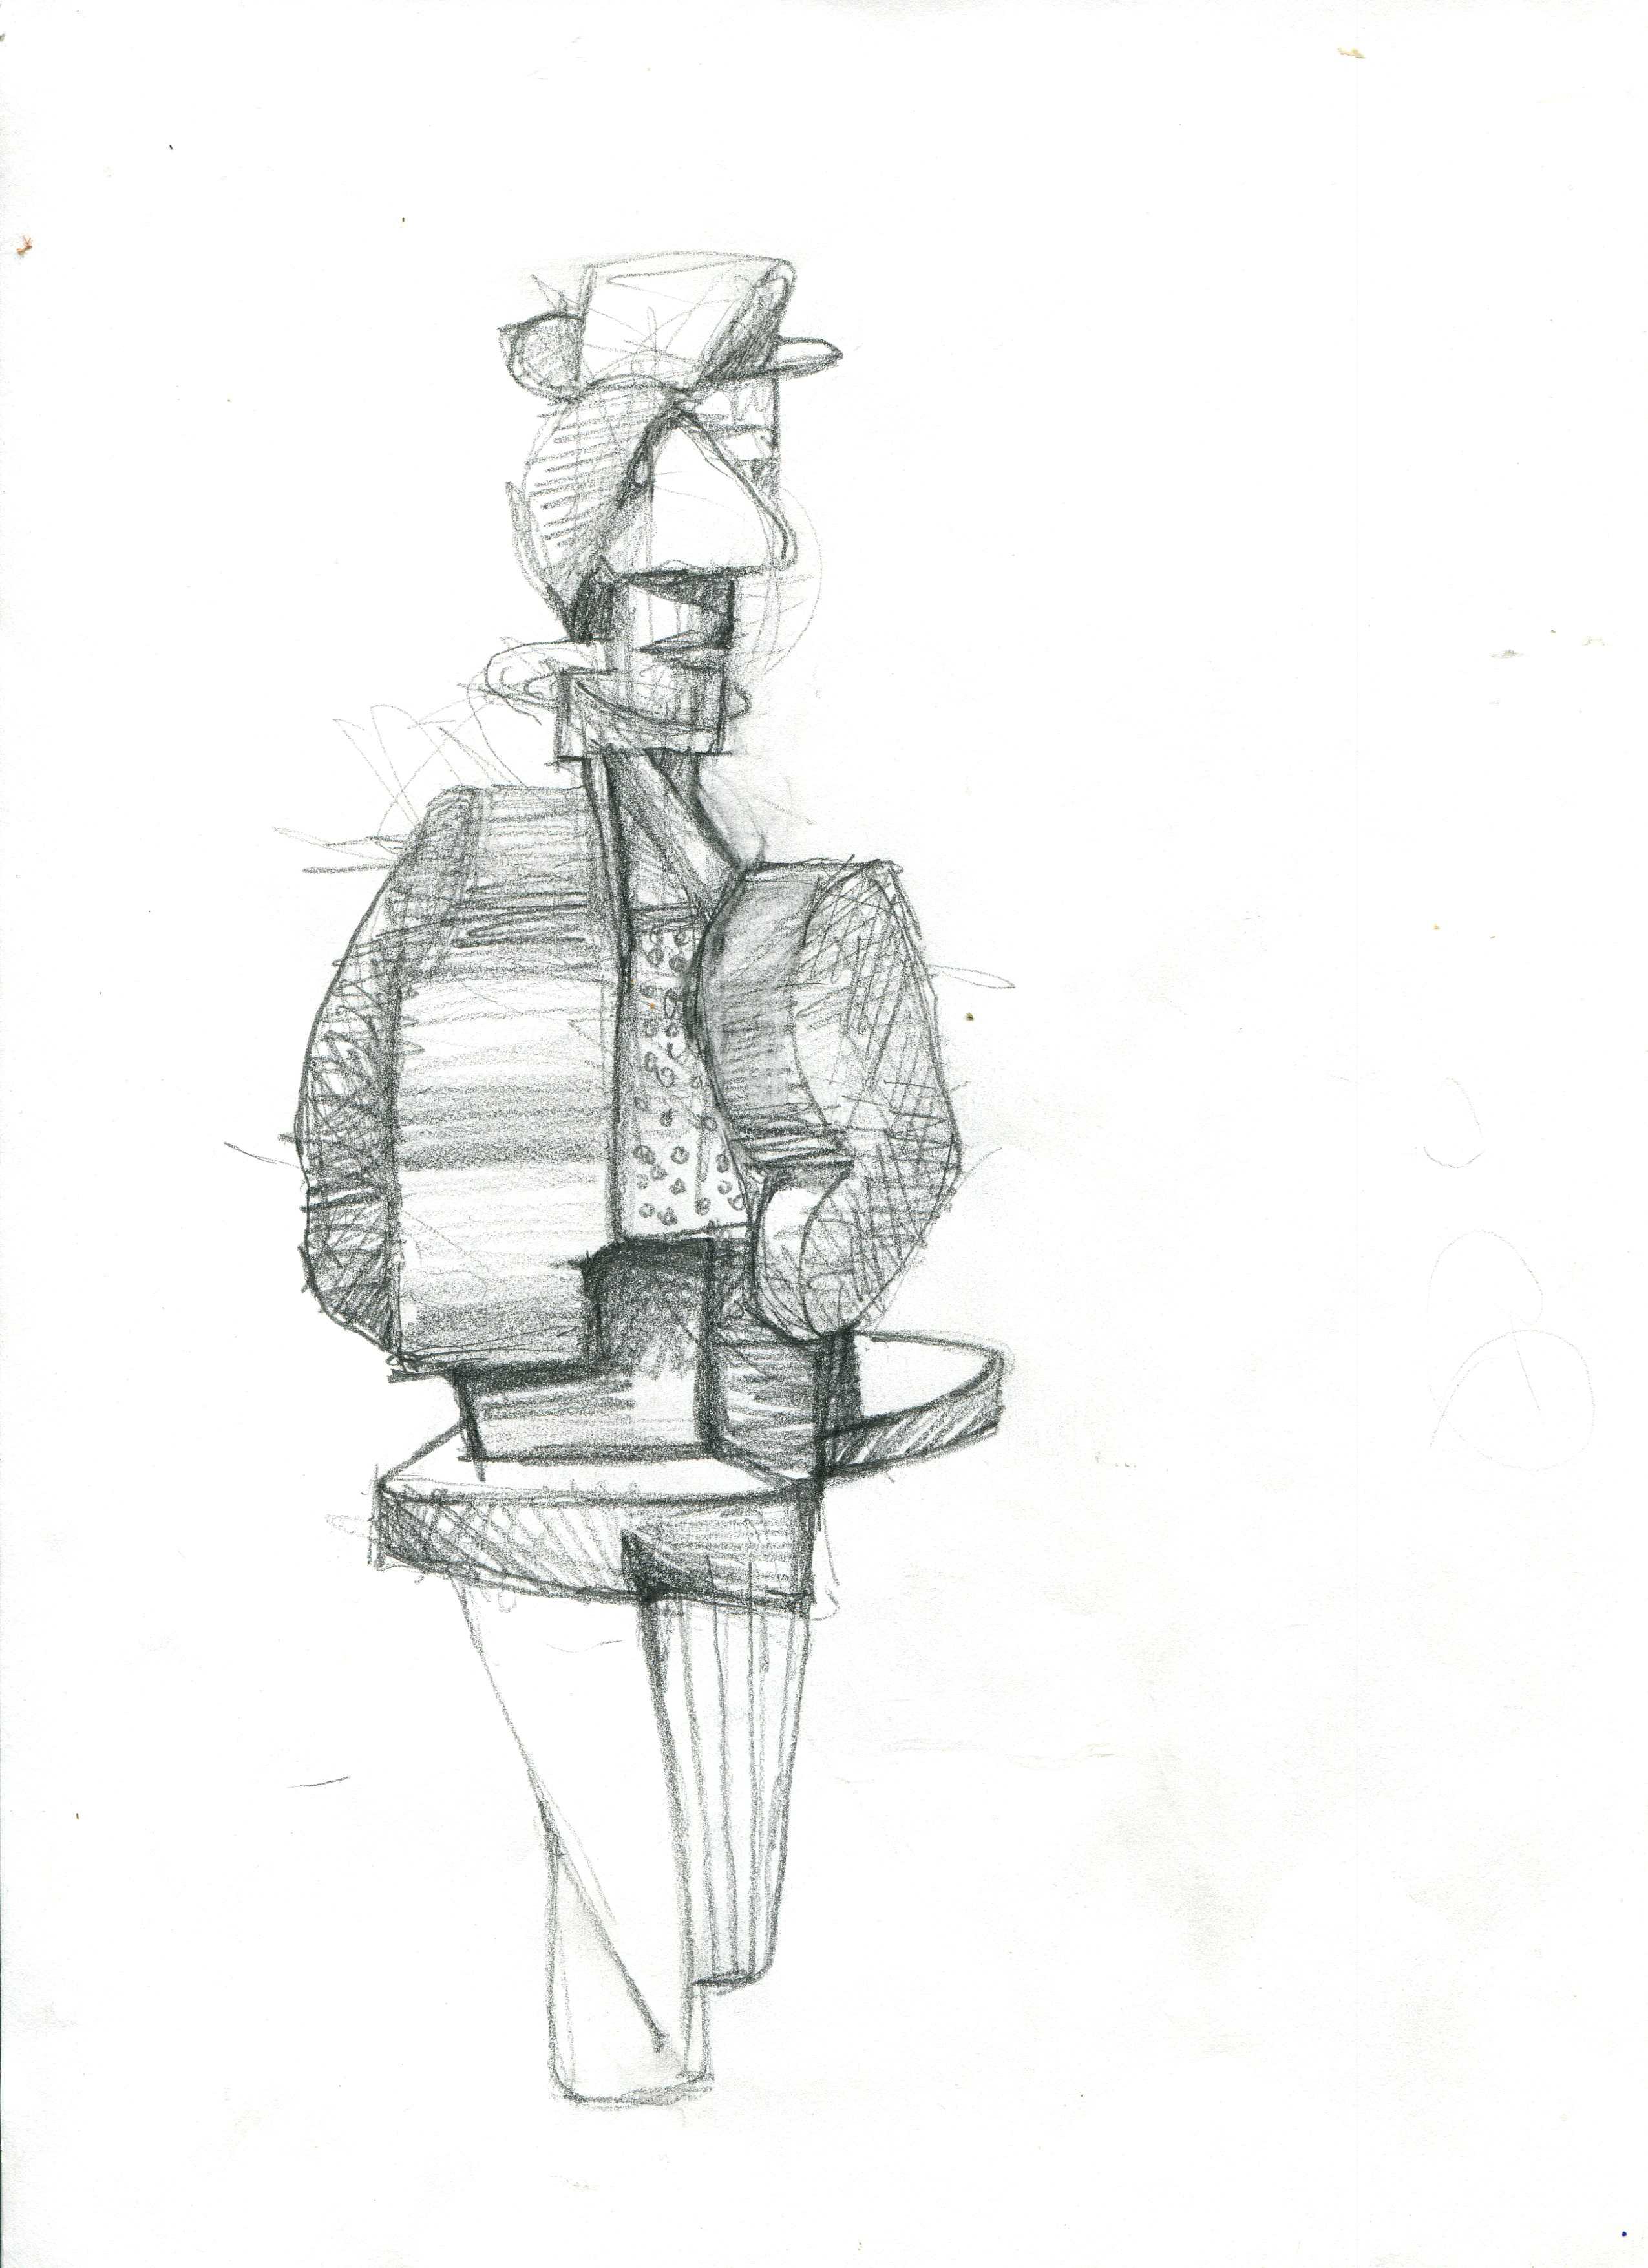 Dandy drawing